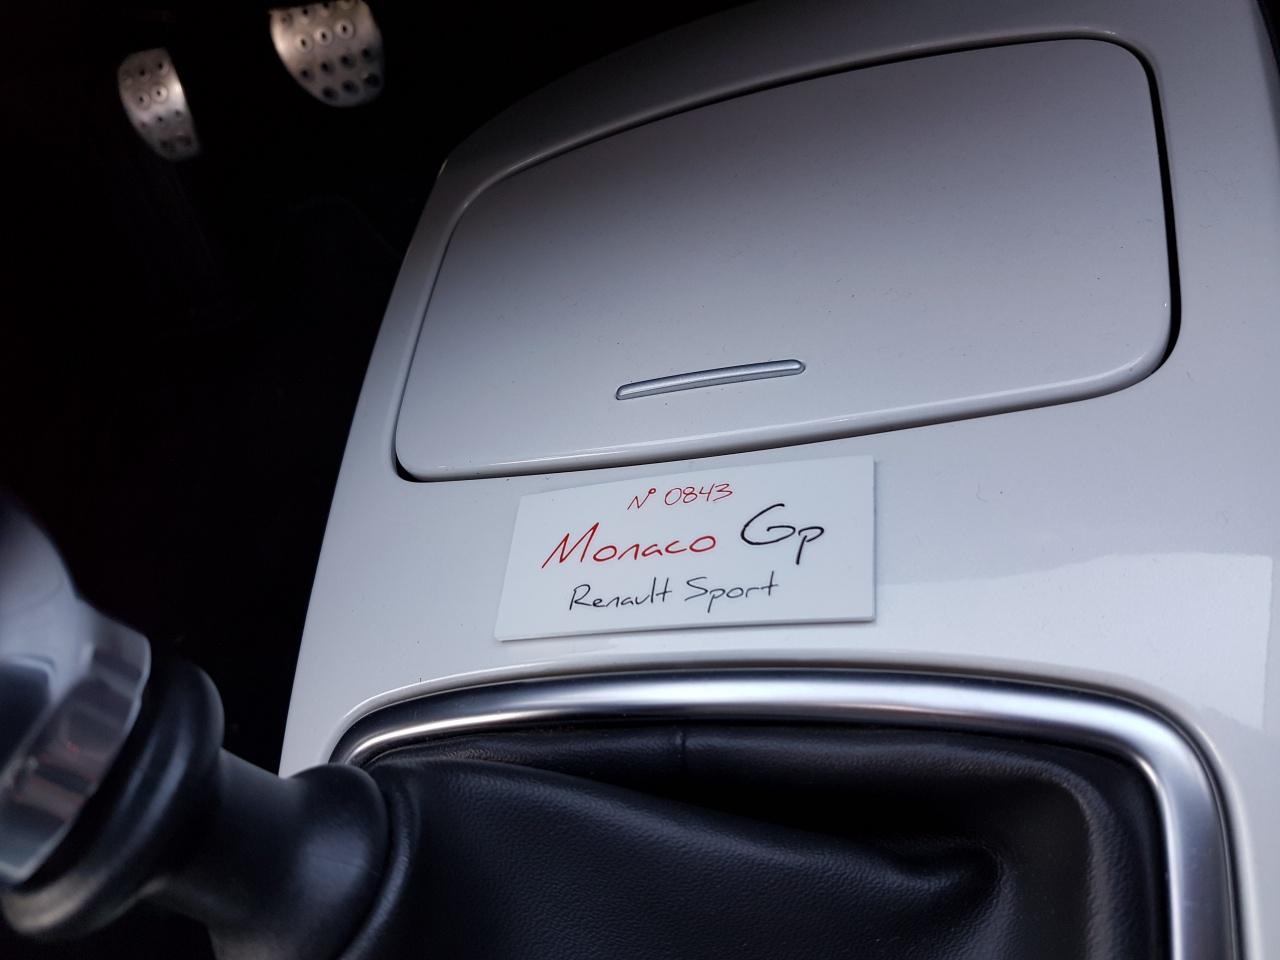 [f5sxd] Laguna III.2 Coupé 150cv Monaco Gp 55290620170102155600